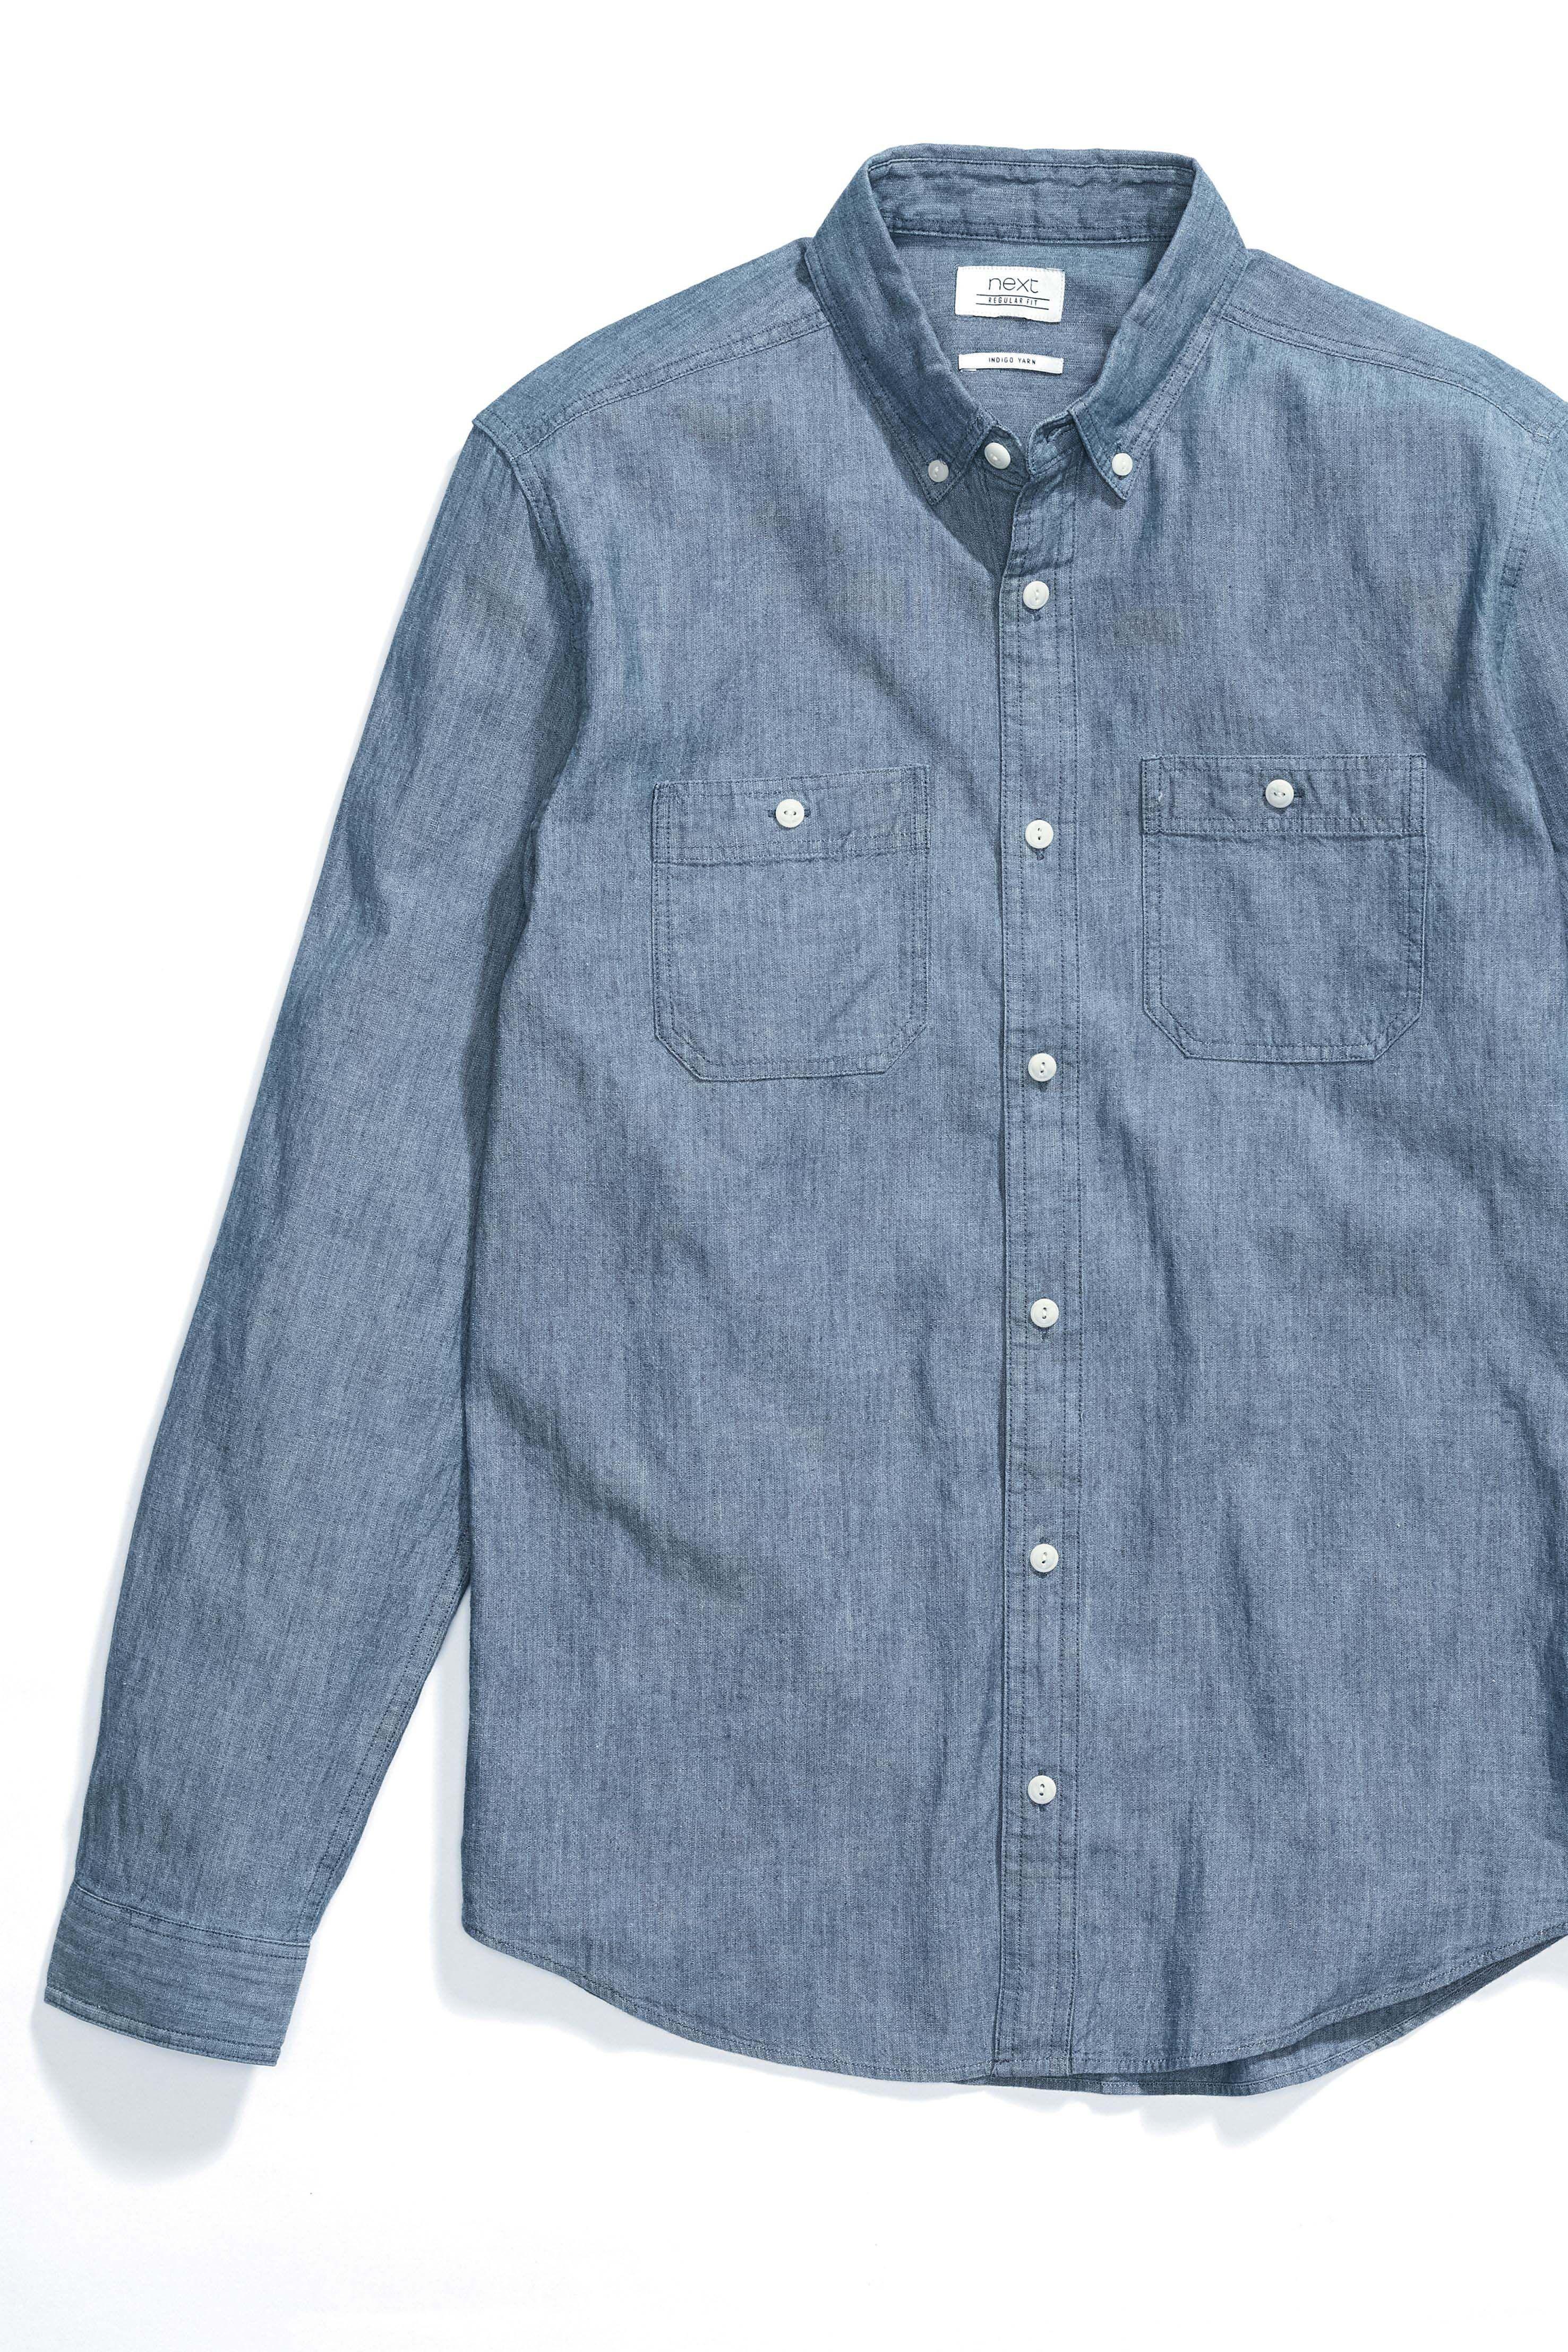 fa0028eb48 Mens Next Denim Blue Long Sleeve Chambray Shirt - Blue